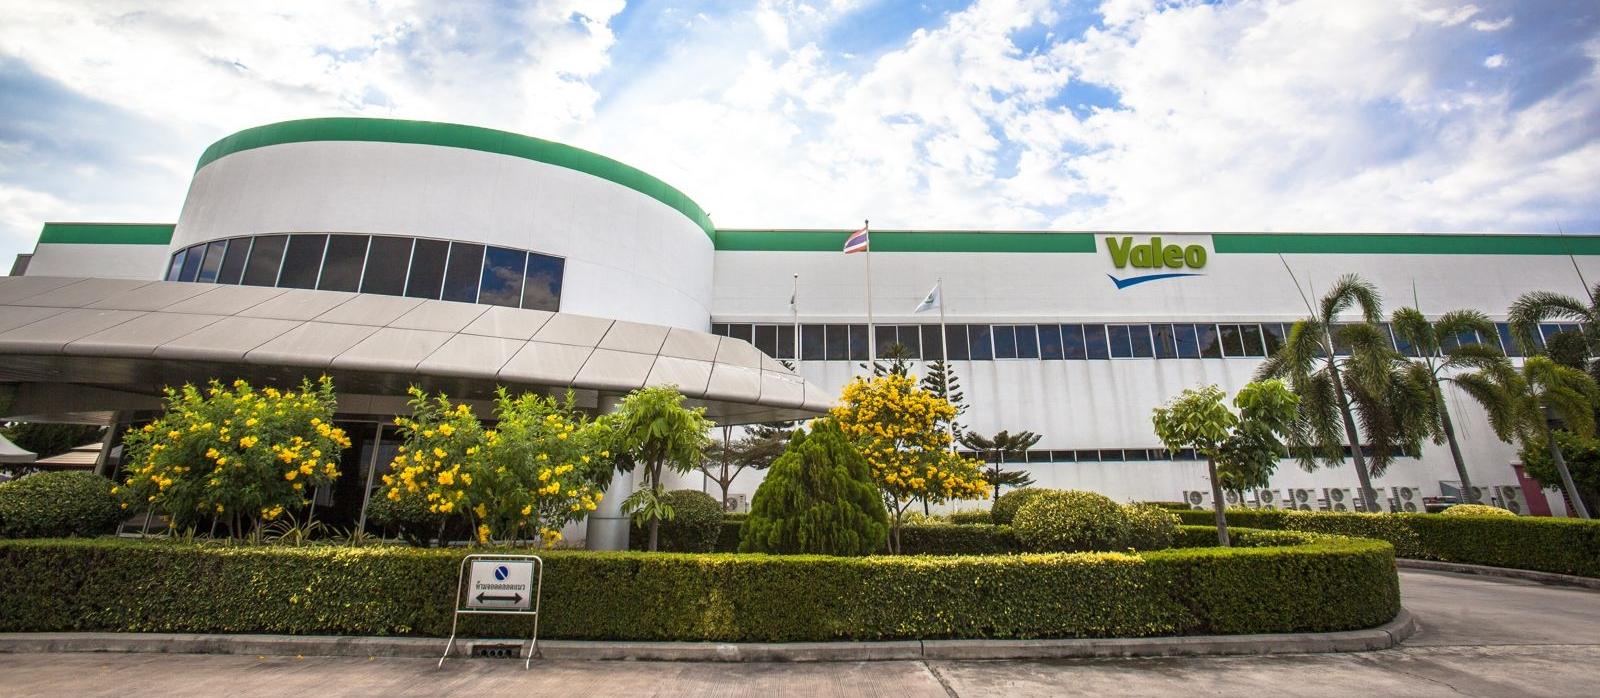 Valeo Thailand plant